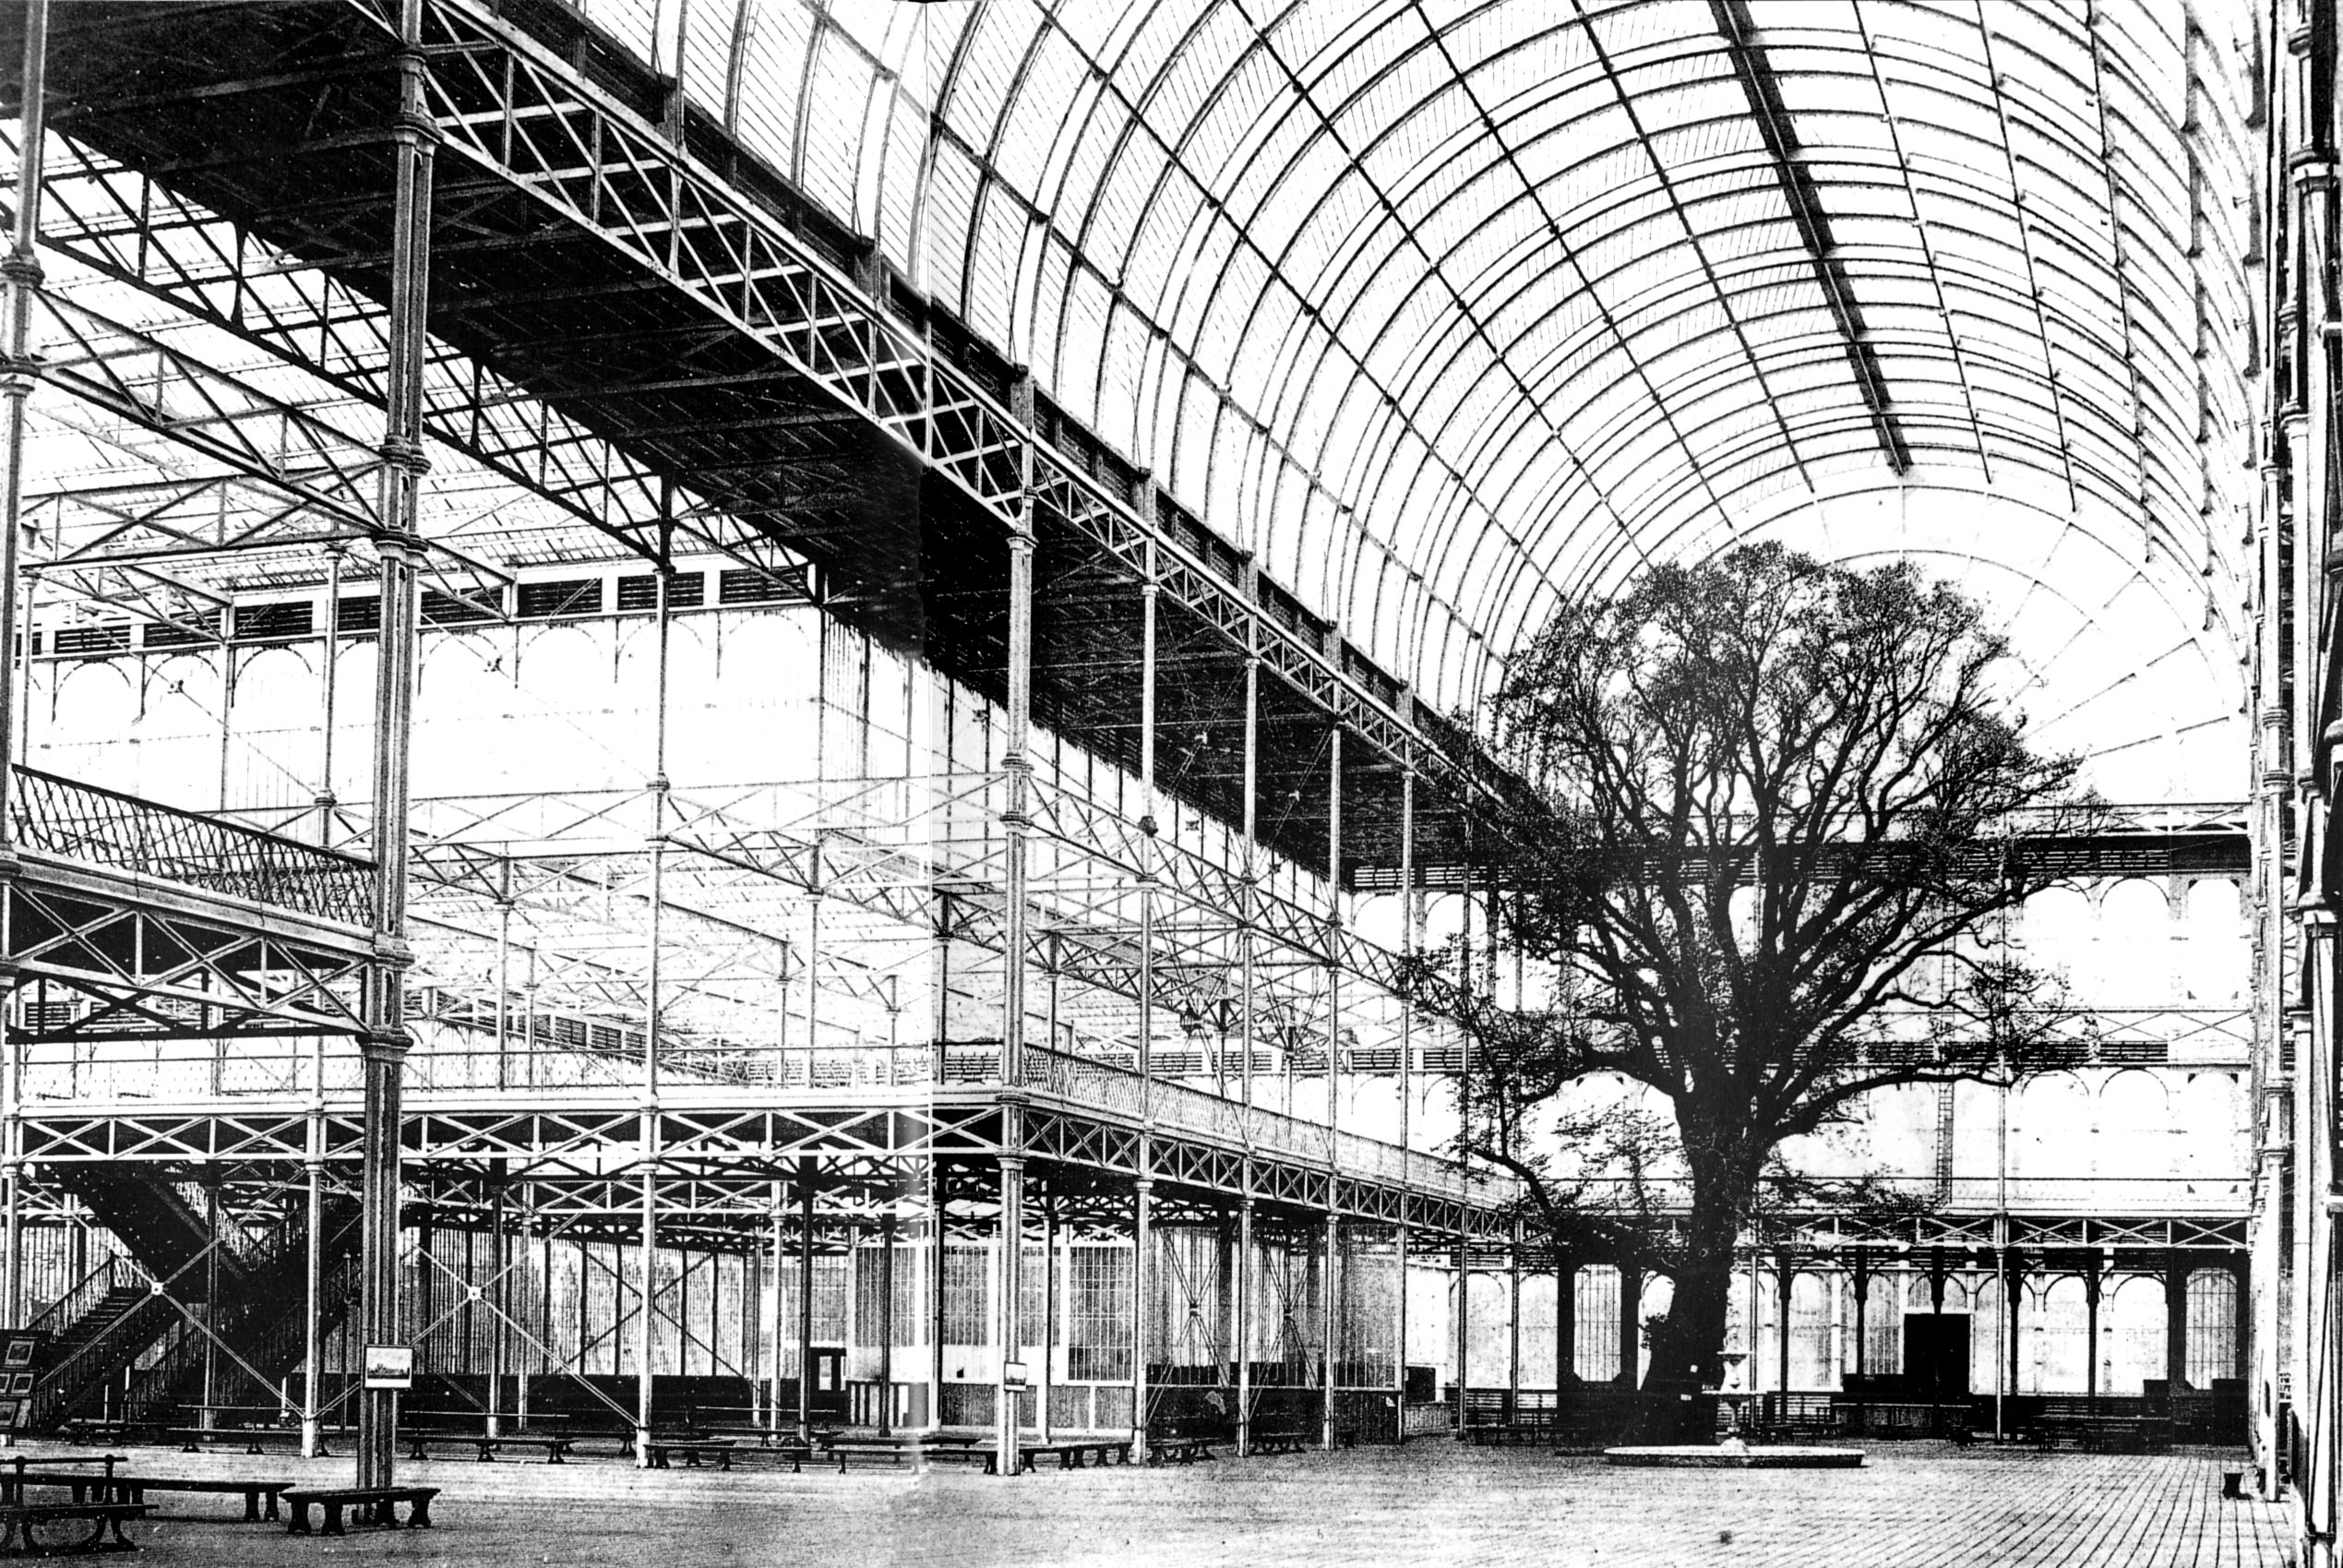 London. Crystal Palace. Uit 1851, voor de wereldtentoonstelling ...